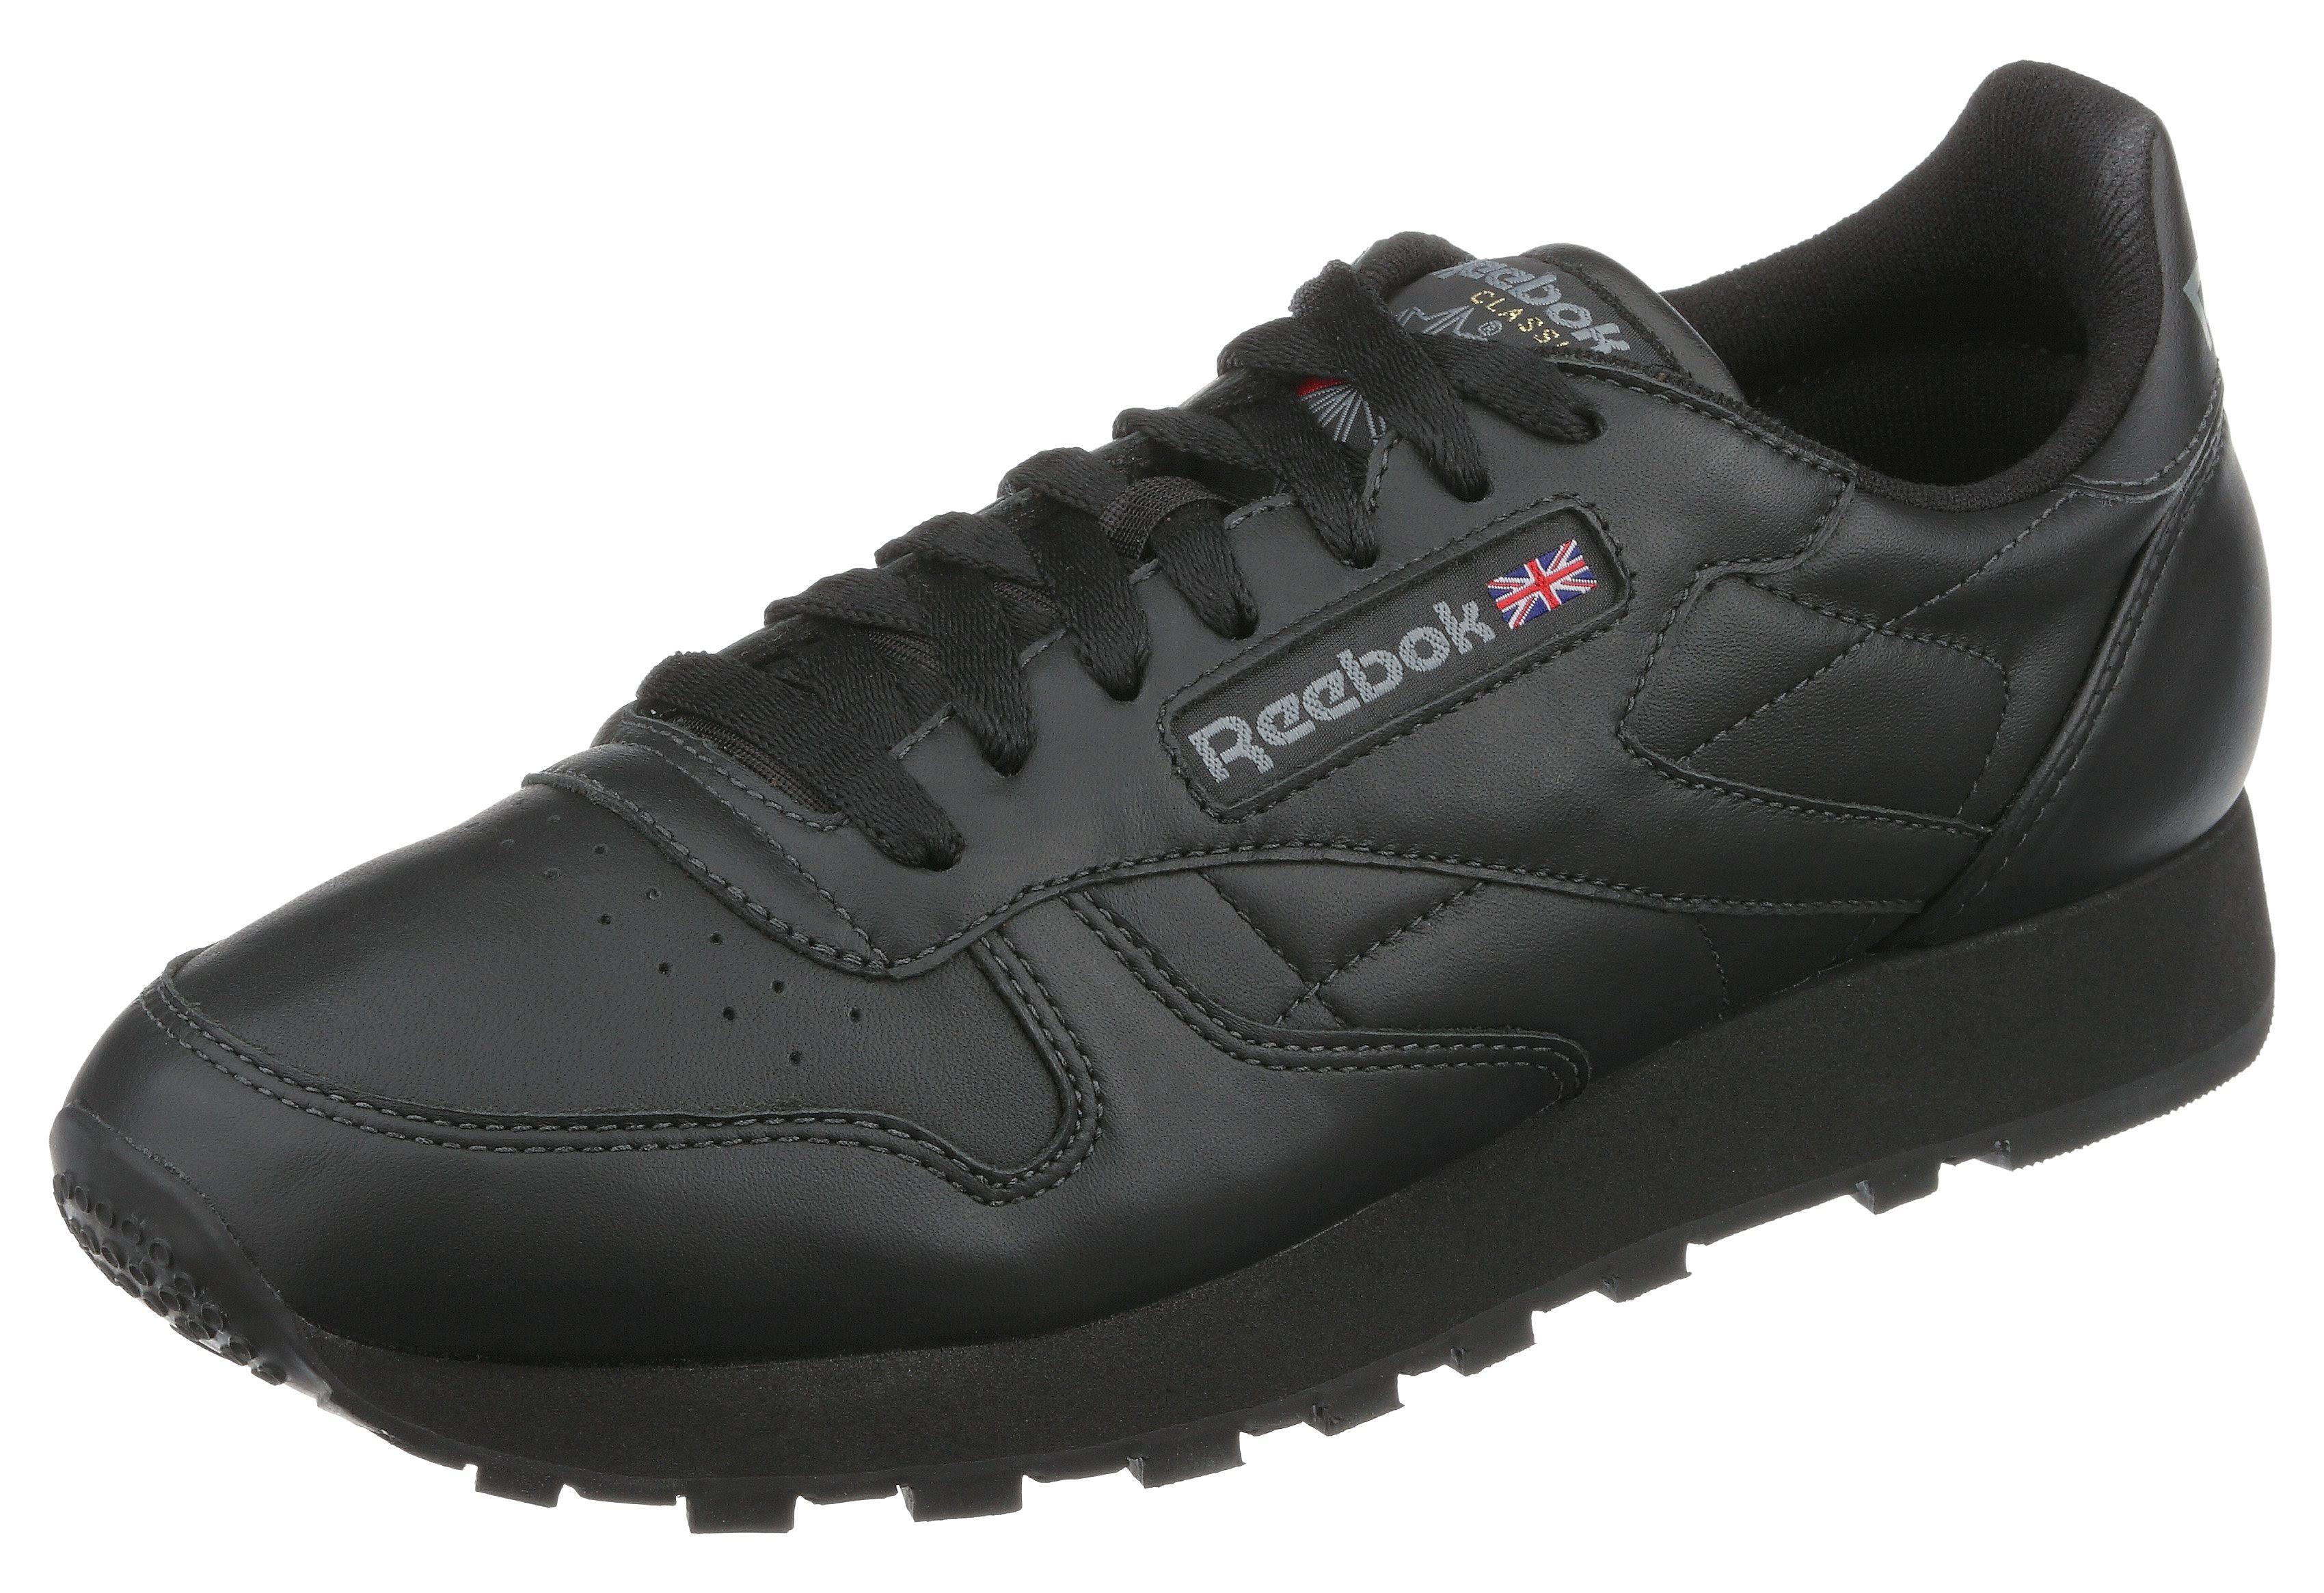 Größe Reebok Leather 5 black Schwarz Eur int 40 Herrensneaker Classic Us 7 f6B6OIn